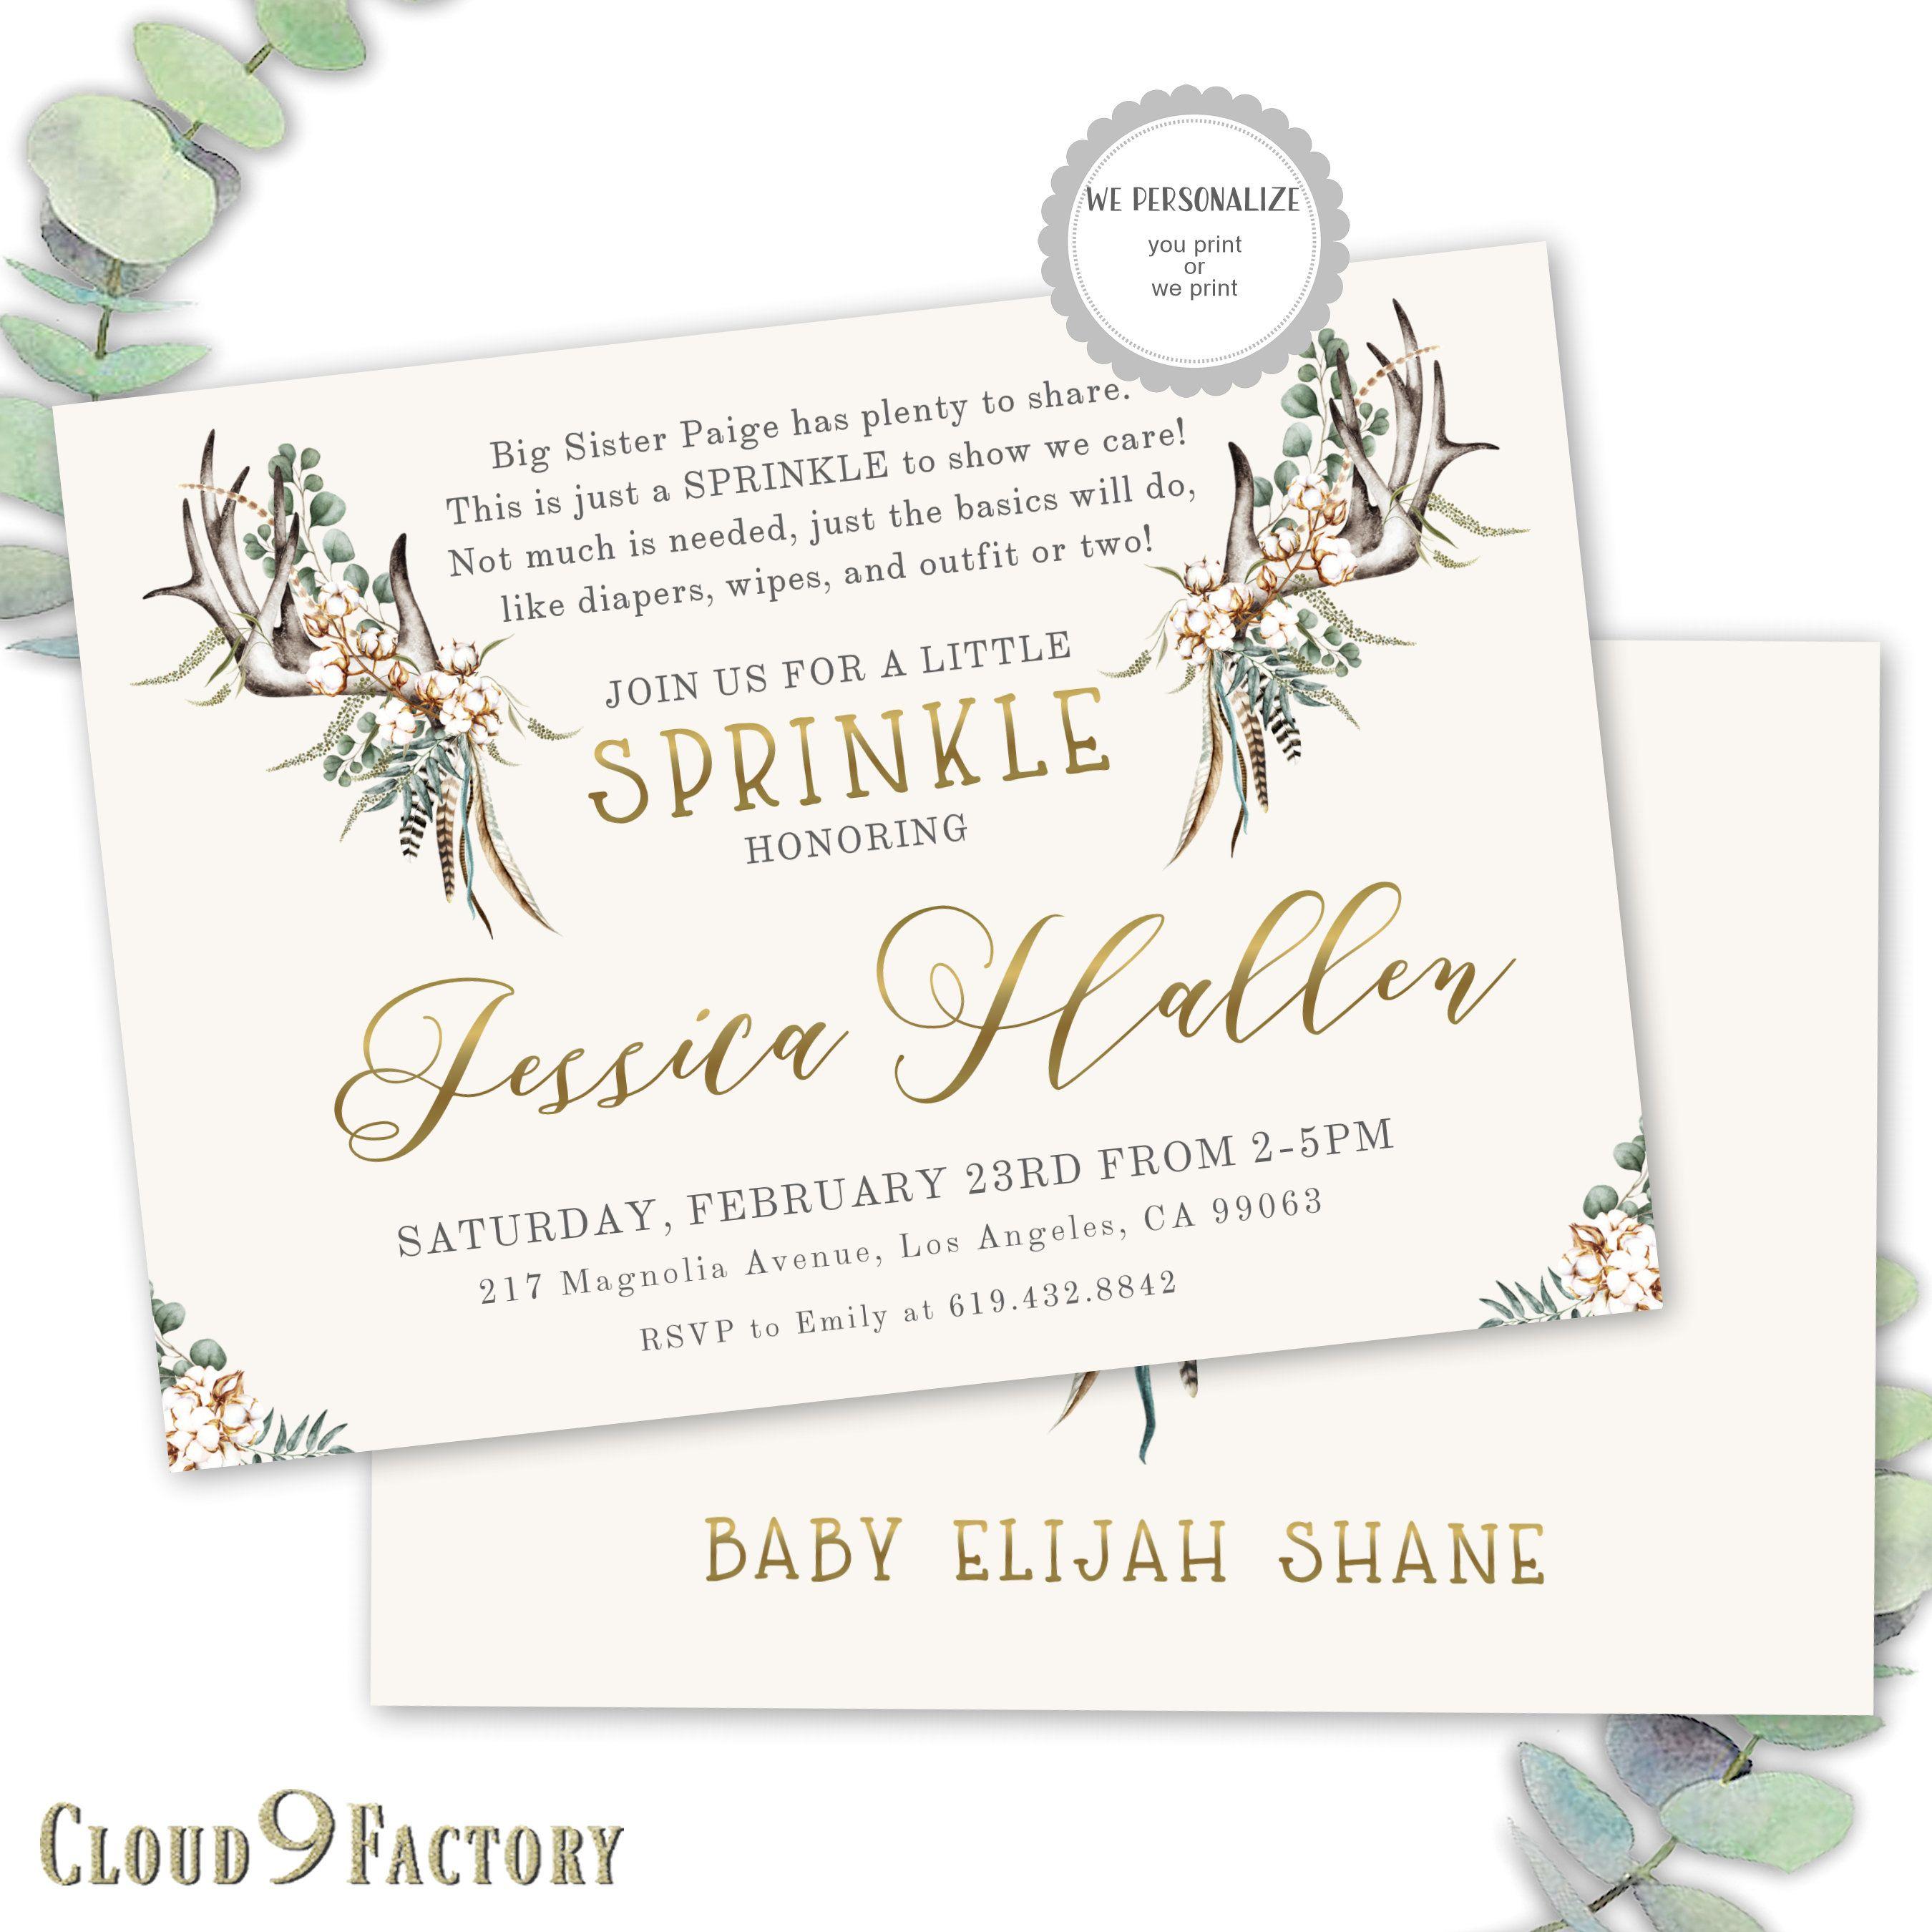 Boy Baby Sprinkle Invitation, Rustic Baby Sprinkle Invite